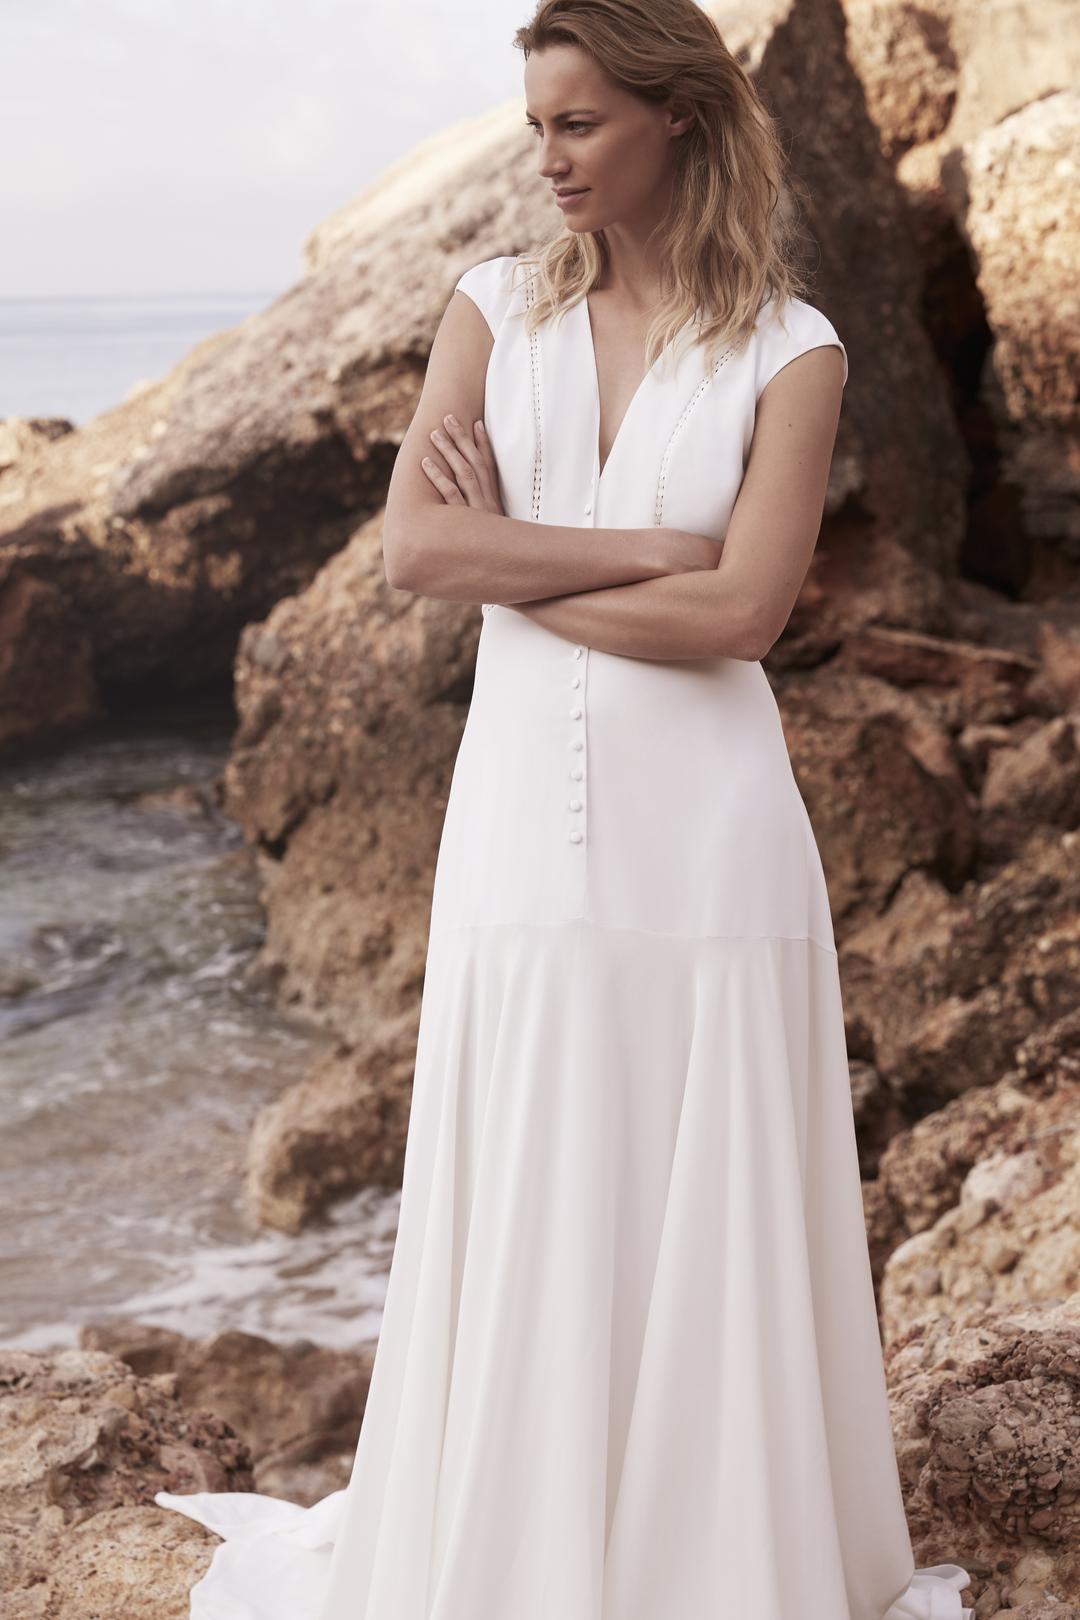 Dress main 2x 1546881867